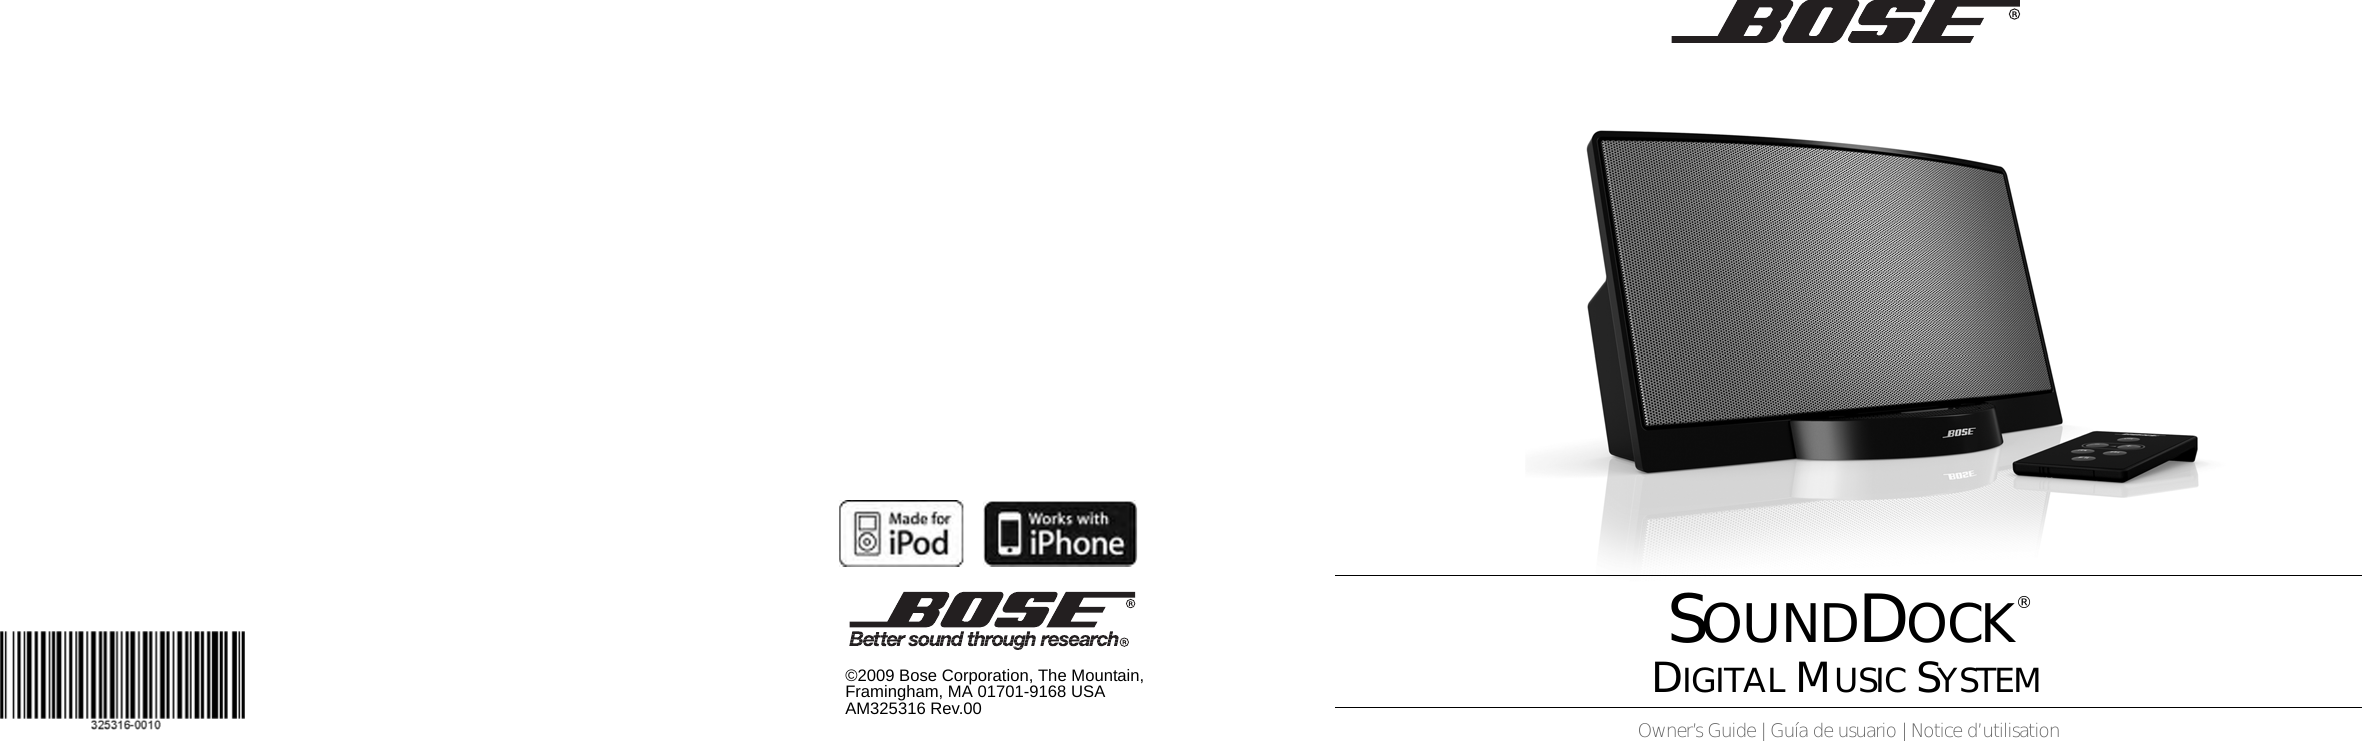 Bose Owg En Sounddock Series SI Cover_8 5x5 5